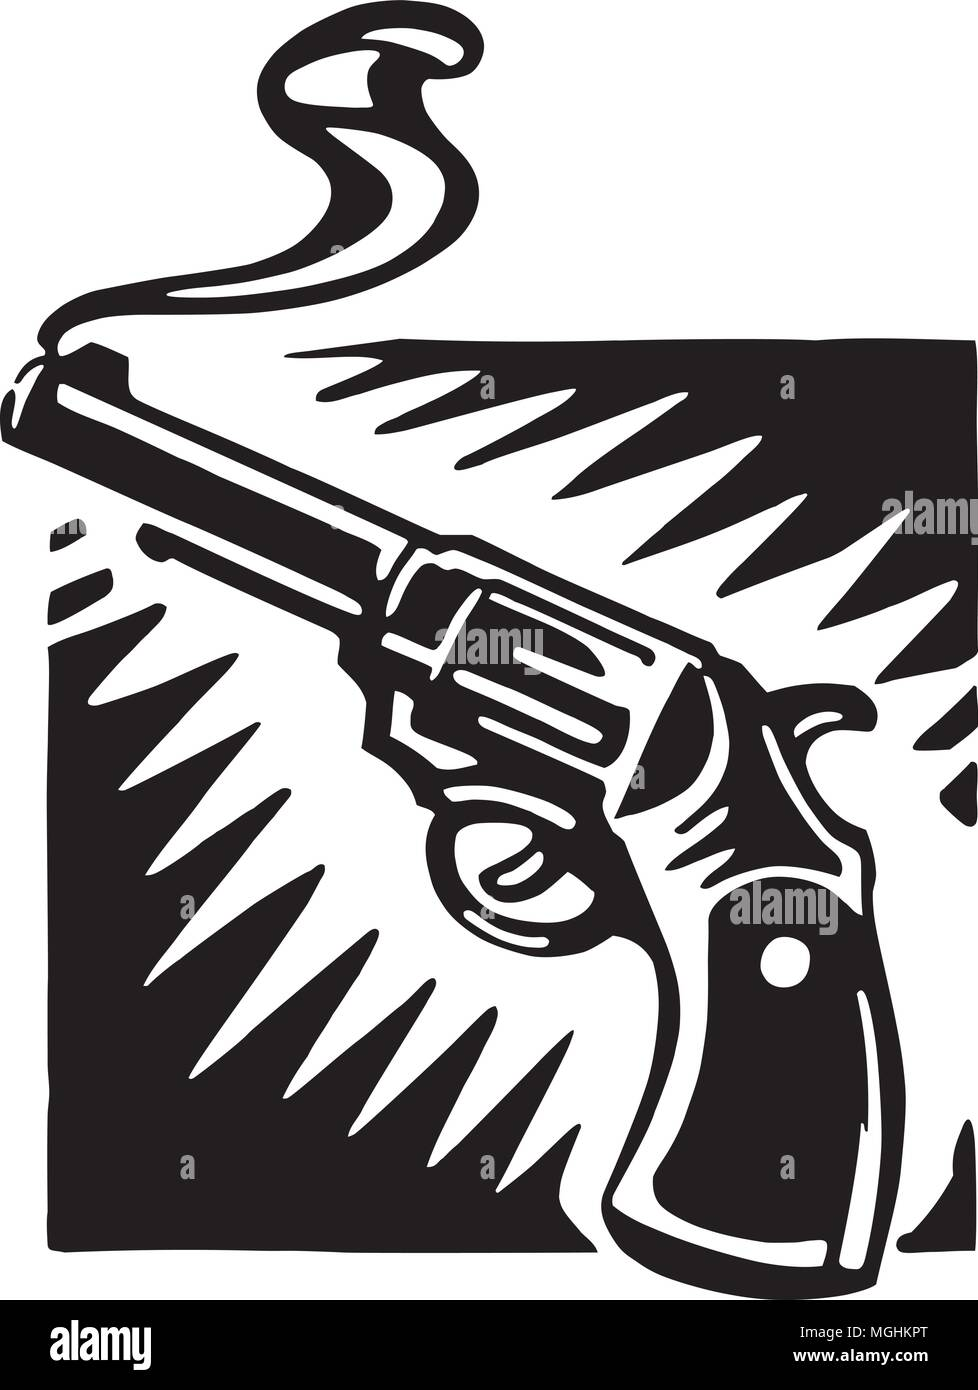 medium resolution of smoking gun retro ilustraci n clipart